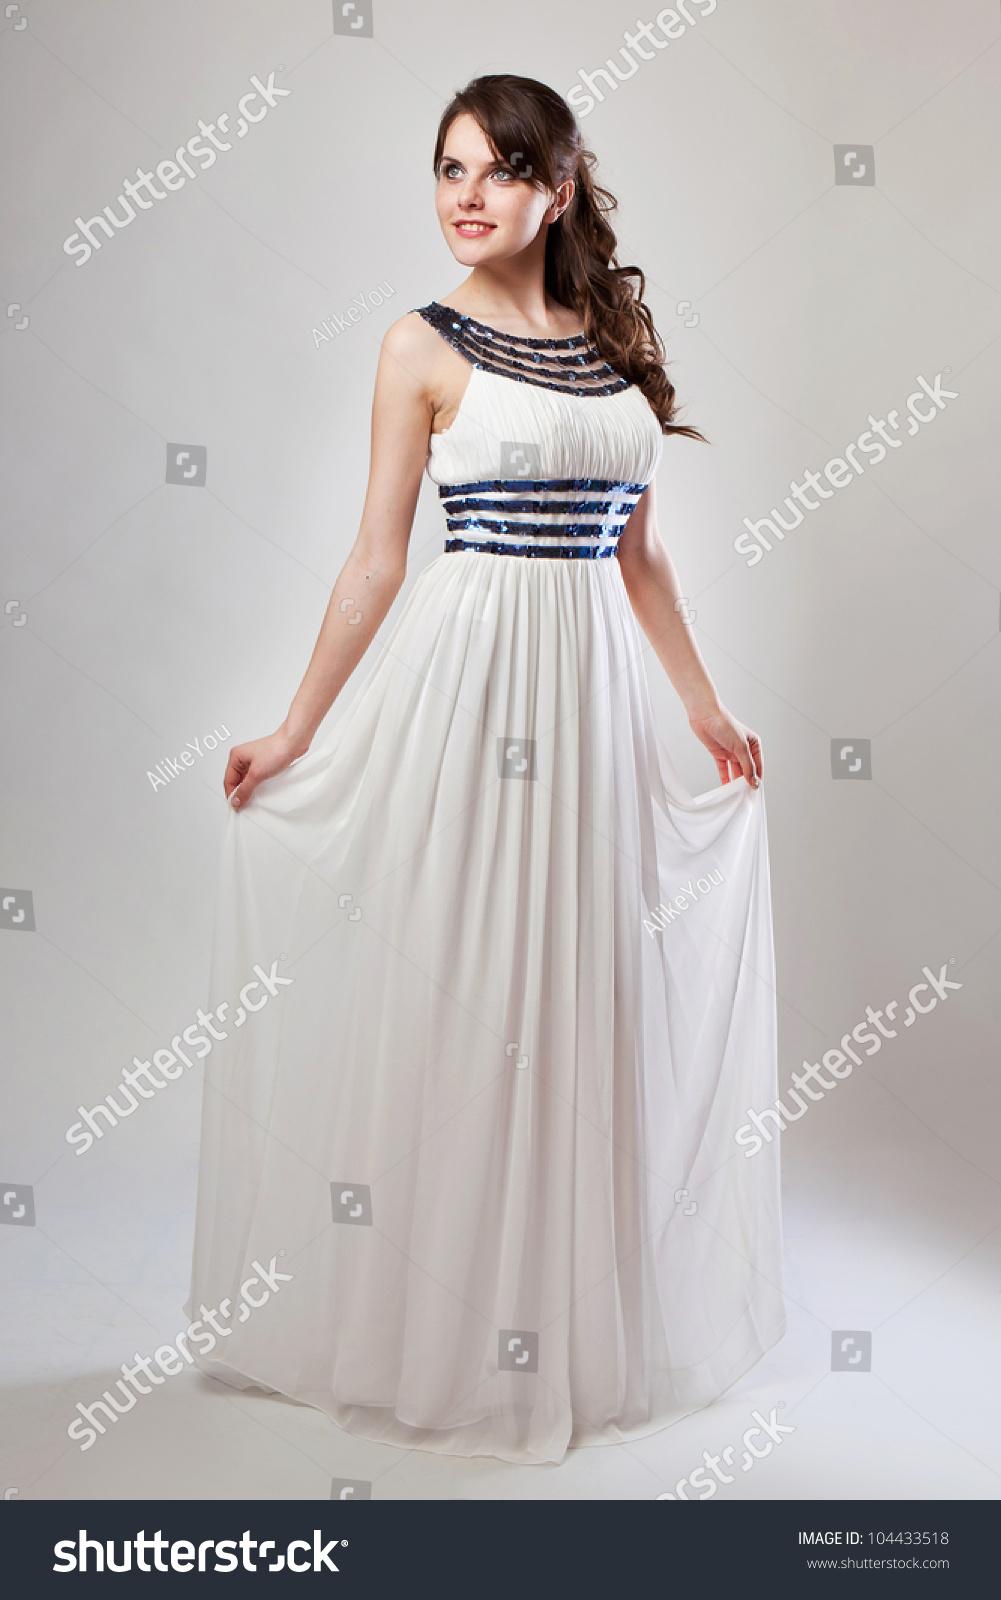 Girl Poses Wedding Dress Studio Shooting Stock Photo (Royalty Free ...